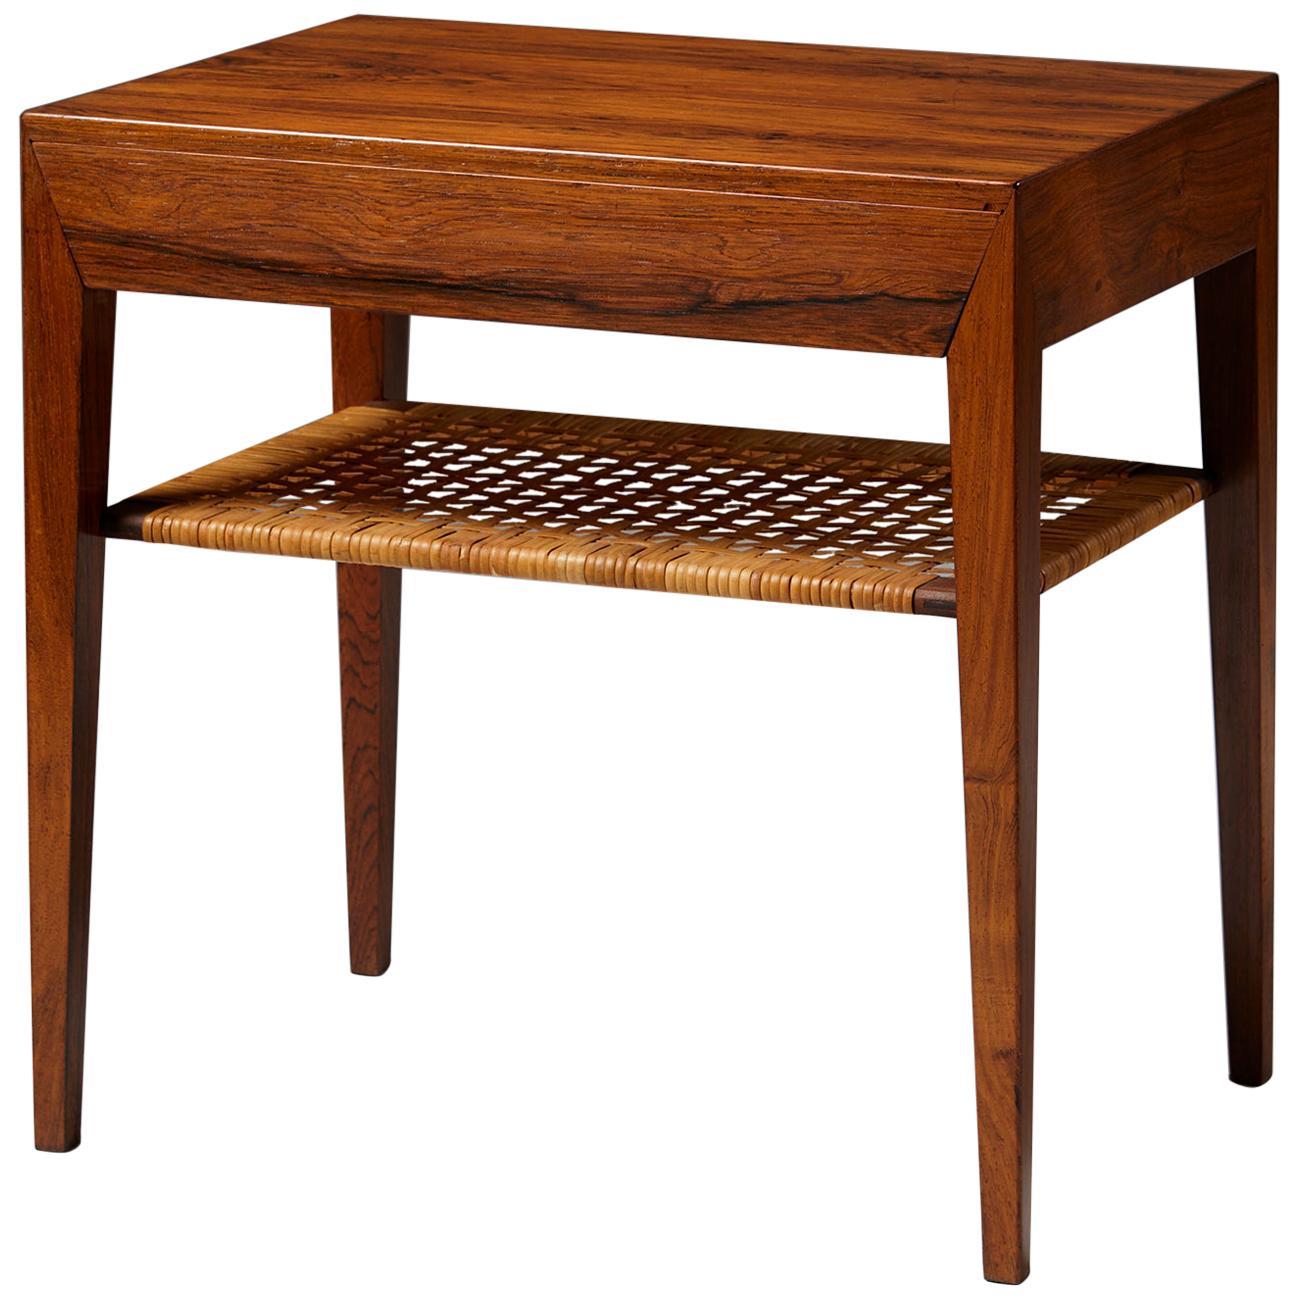 Side Table Designed by Severin Hansen for Haslev Mobelfrabrik, Denmark, 1950s